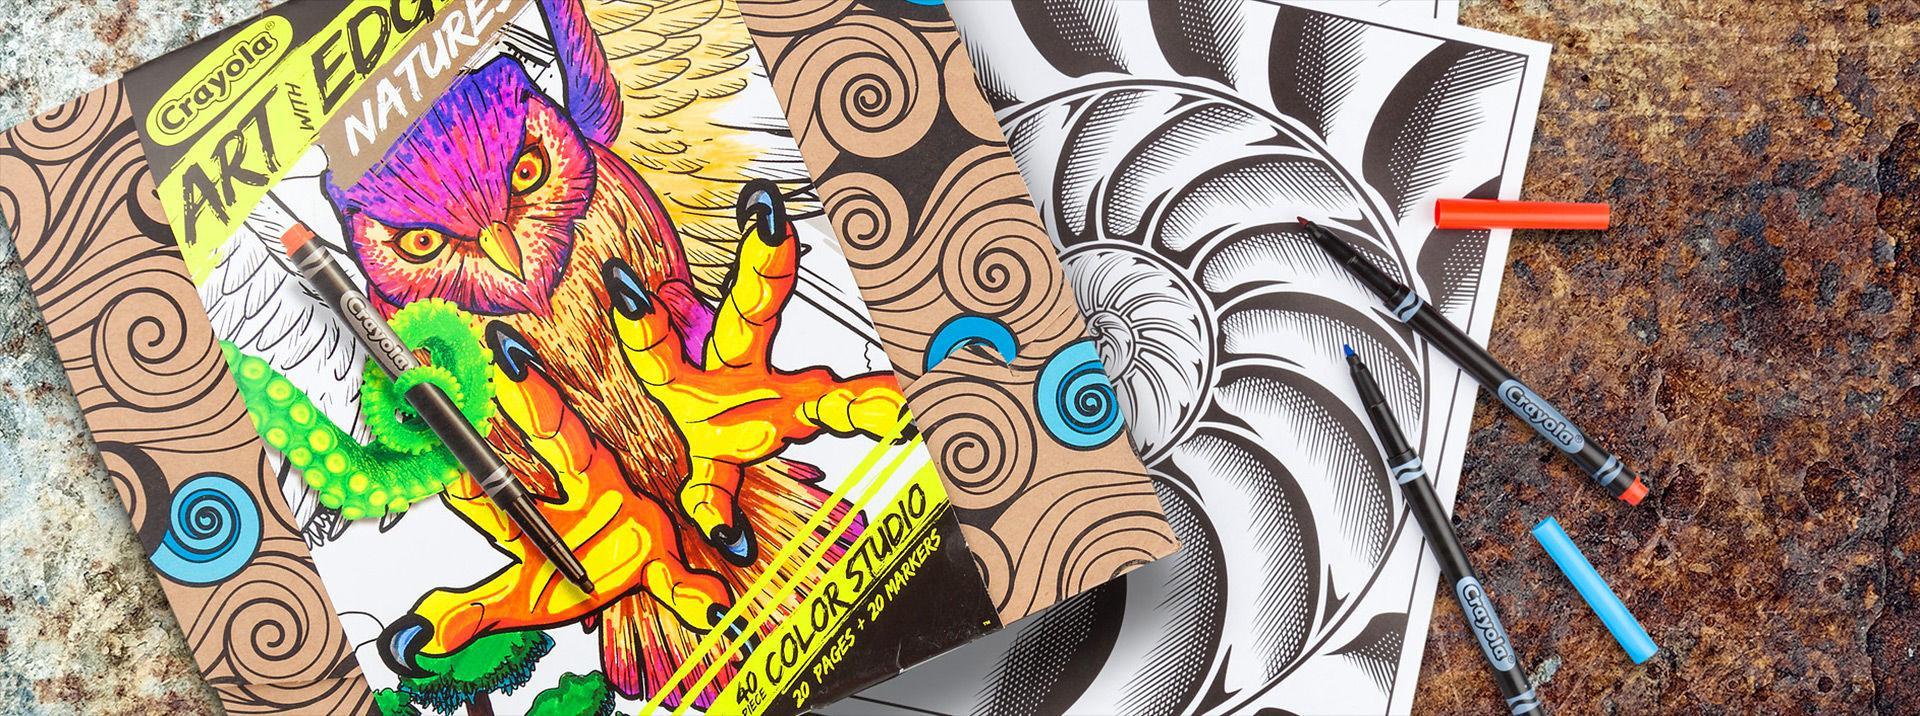 Amazon Crayola Art with Edge FX Colored Pencils 16